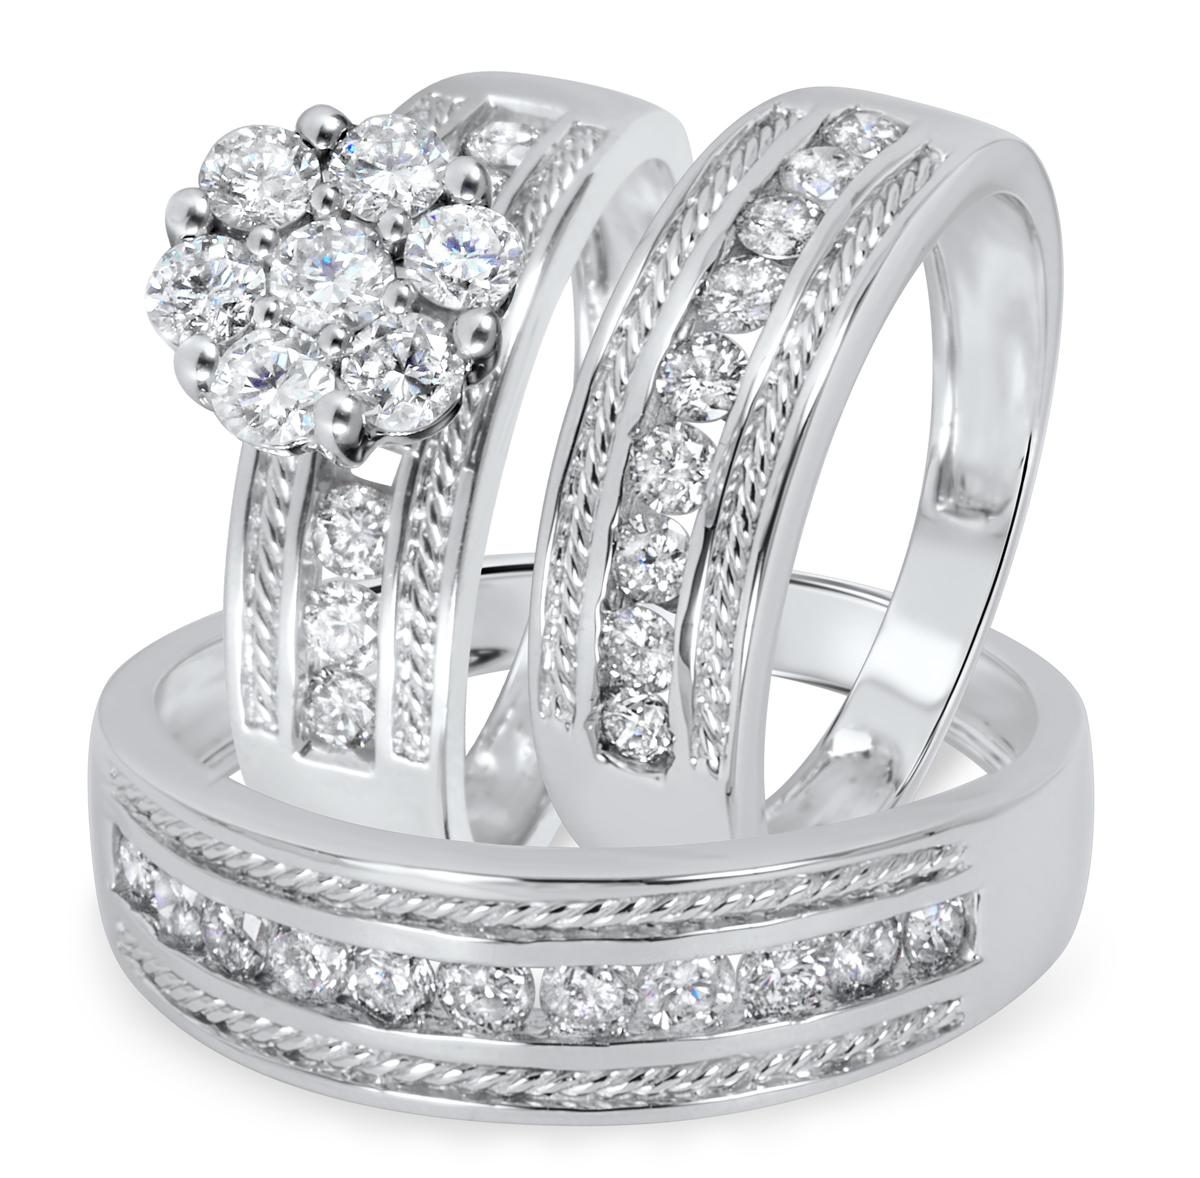 1 2/3 CT. T.W. Diamond Ladies Engagement Ring, Wedding Band, Men's Wedding Band